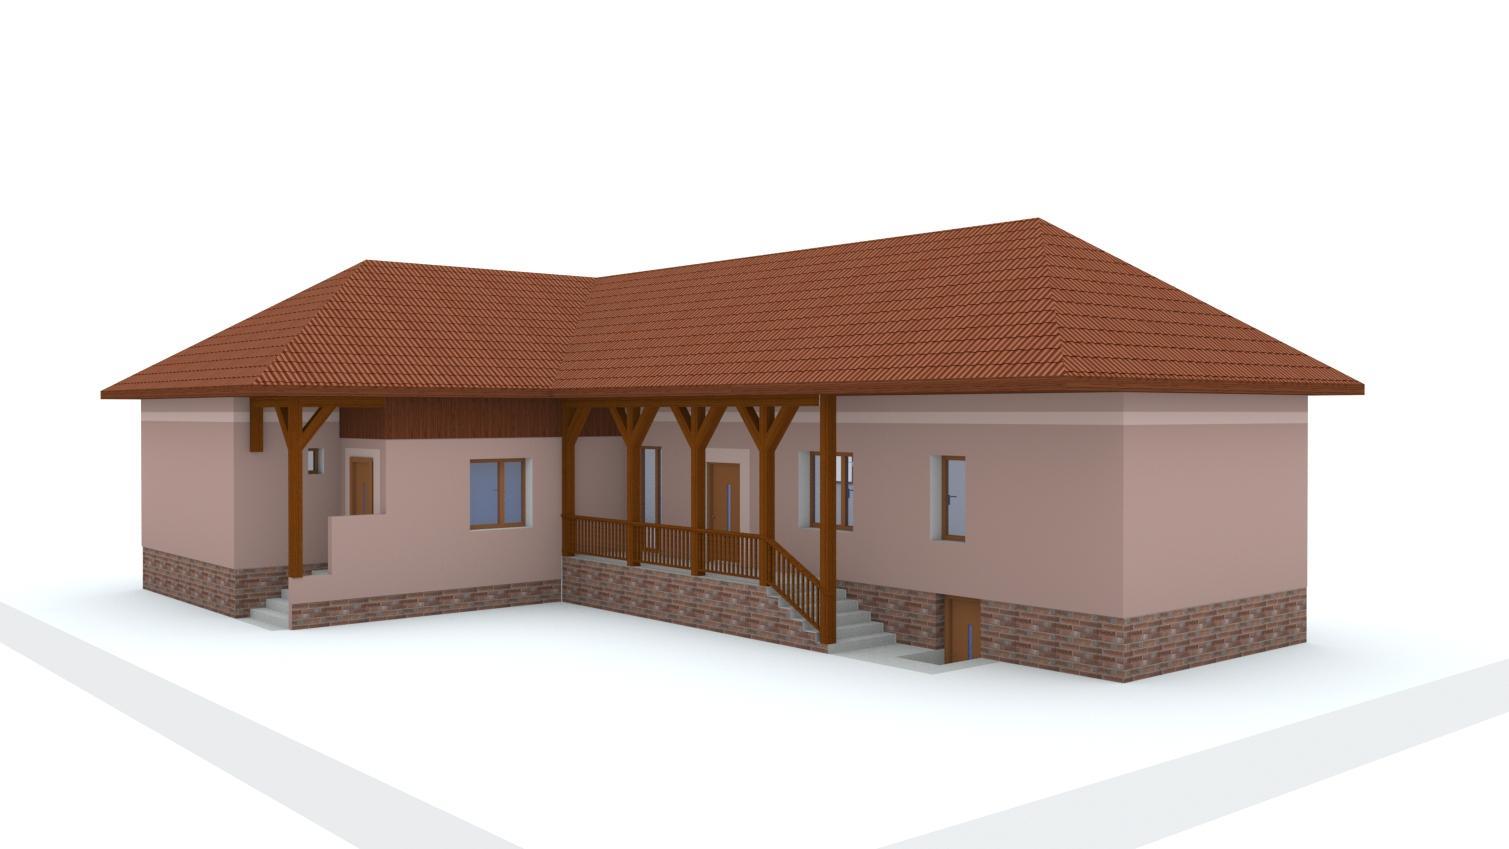 Návrh fasády rodinného domu - Obrázok č. 6